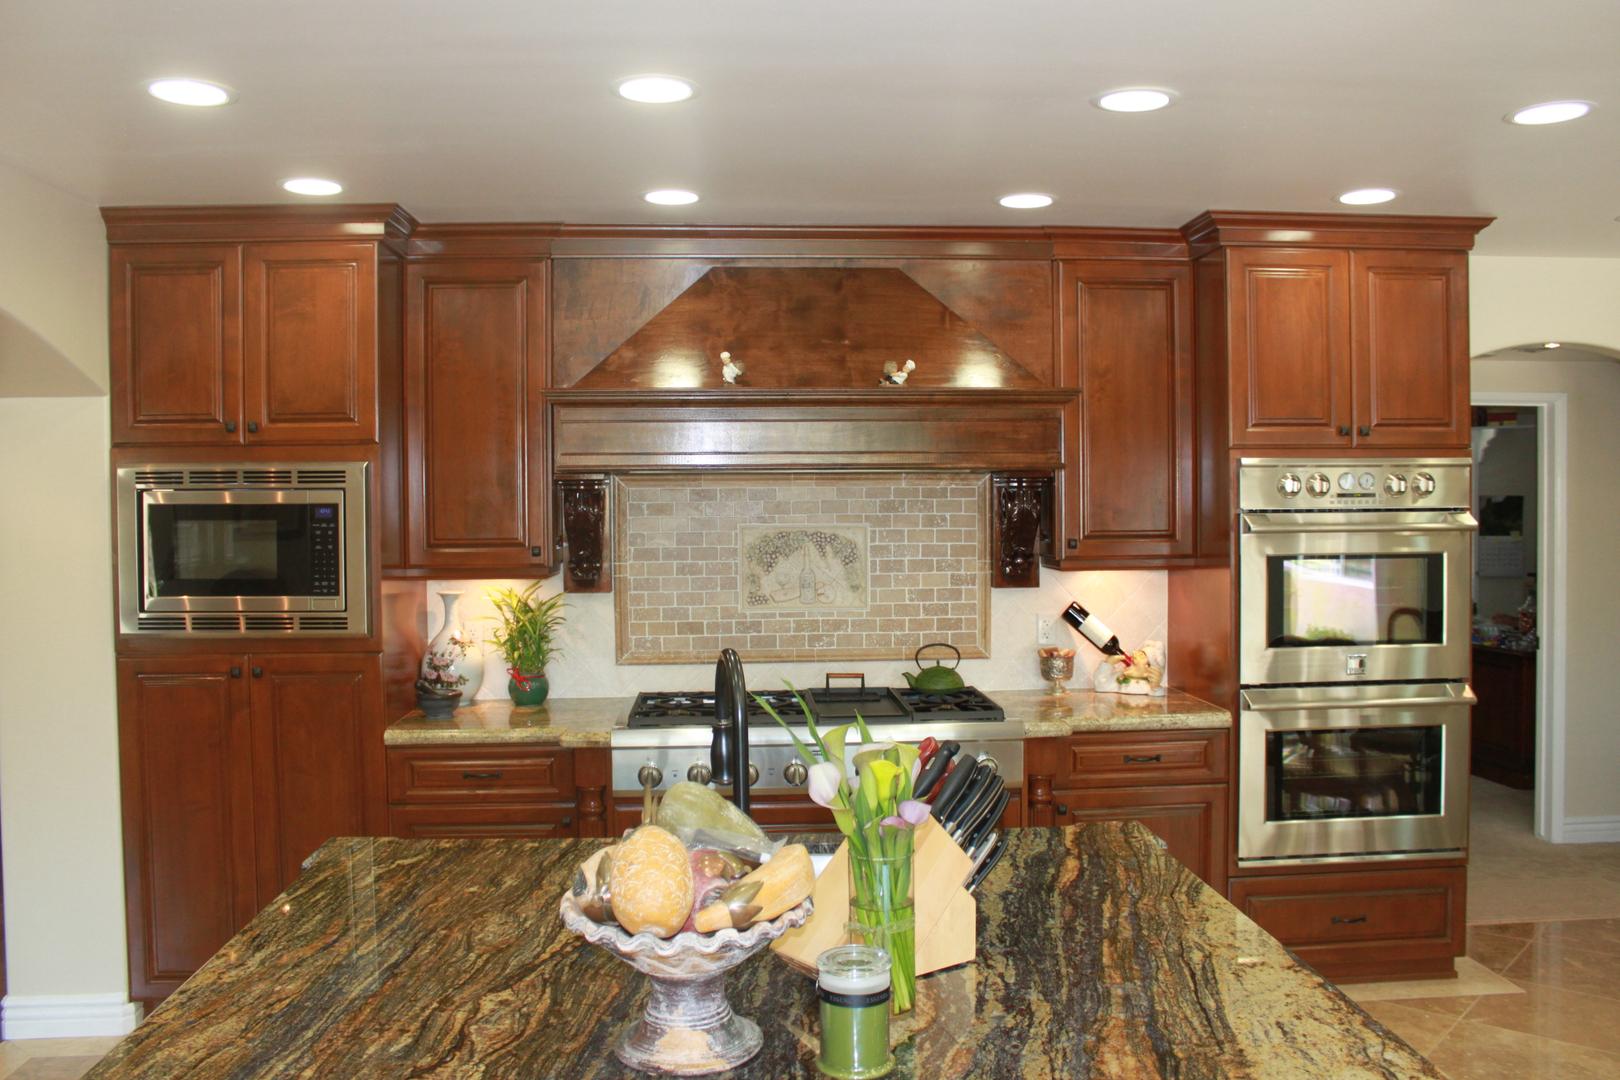 Wooden kitchen area